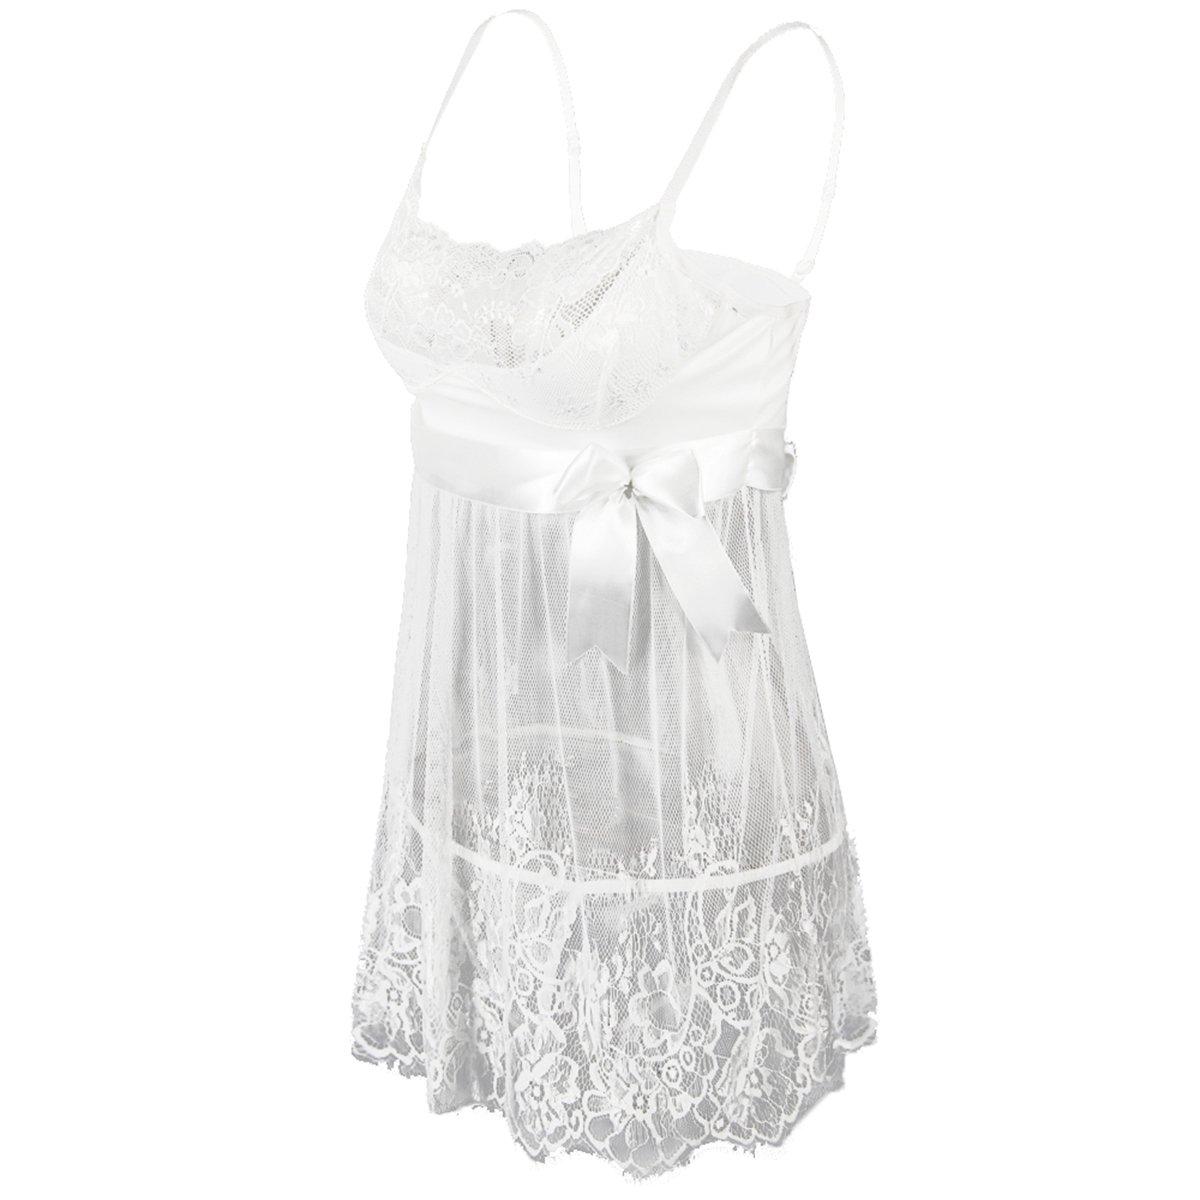 0fcfbe77d Amazon.com  EVAbaby Sexy Lingerie for Women White Lace Chemise Dress Bridal  Sleepwear Set Sheer Babydoll  Clothing